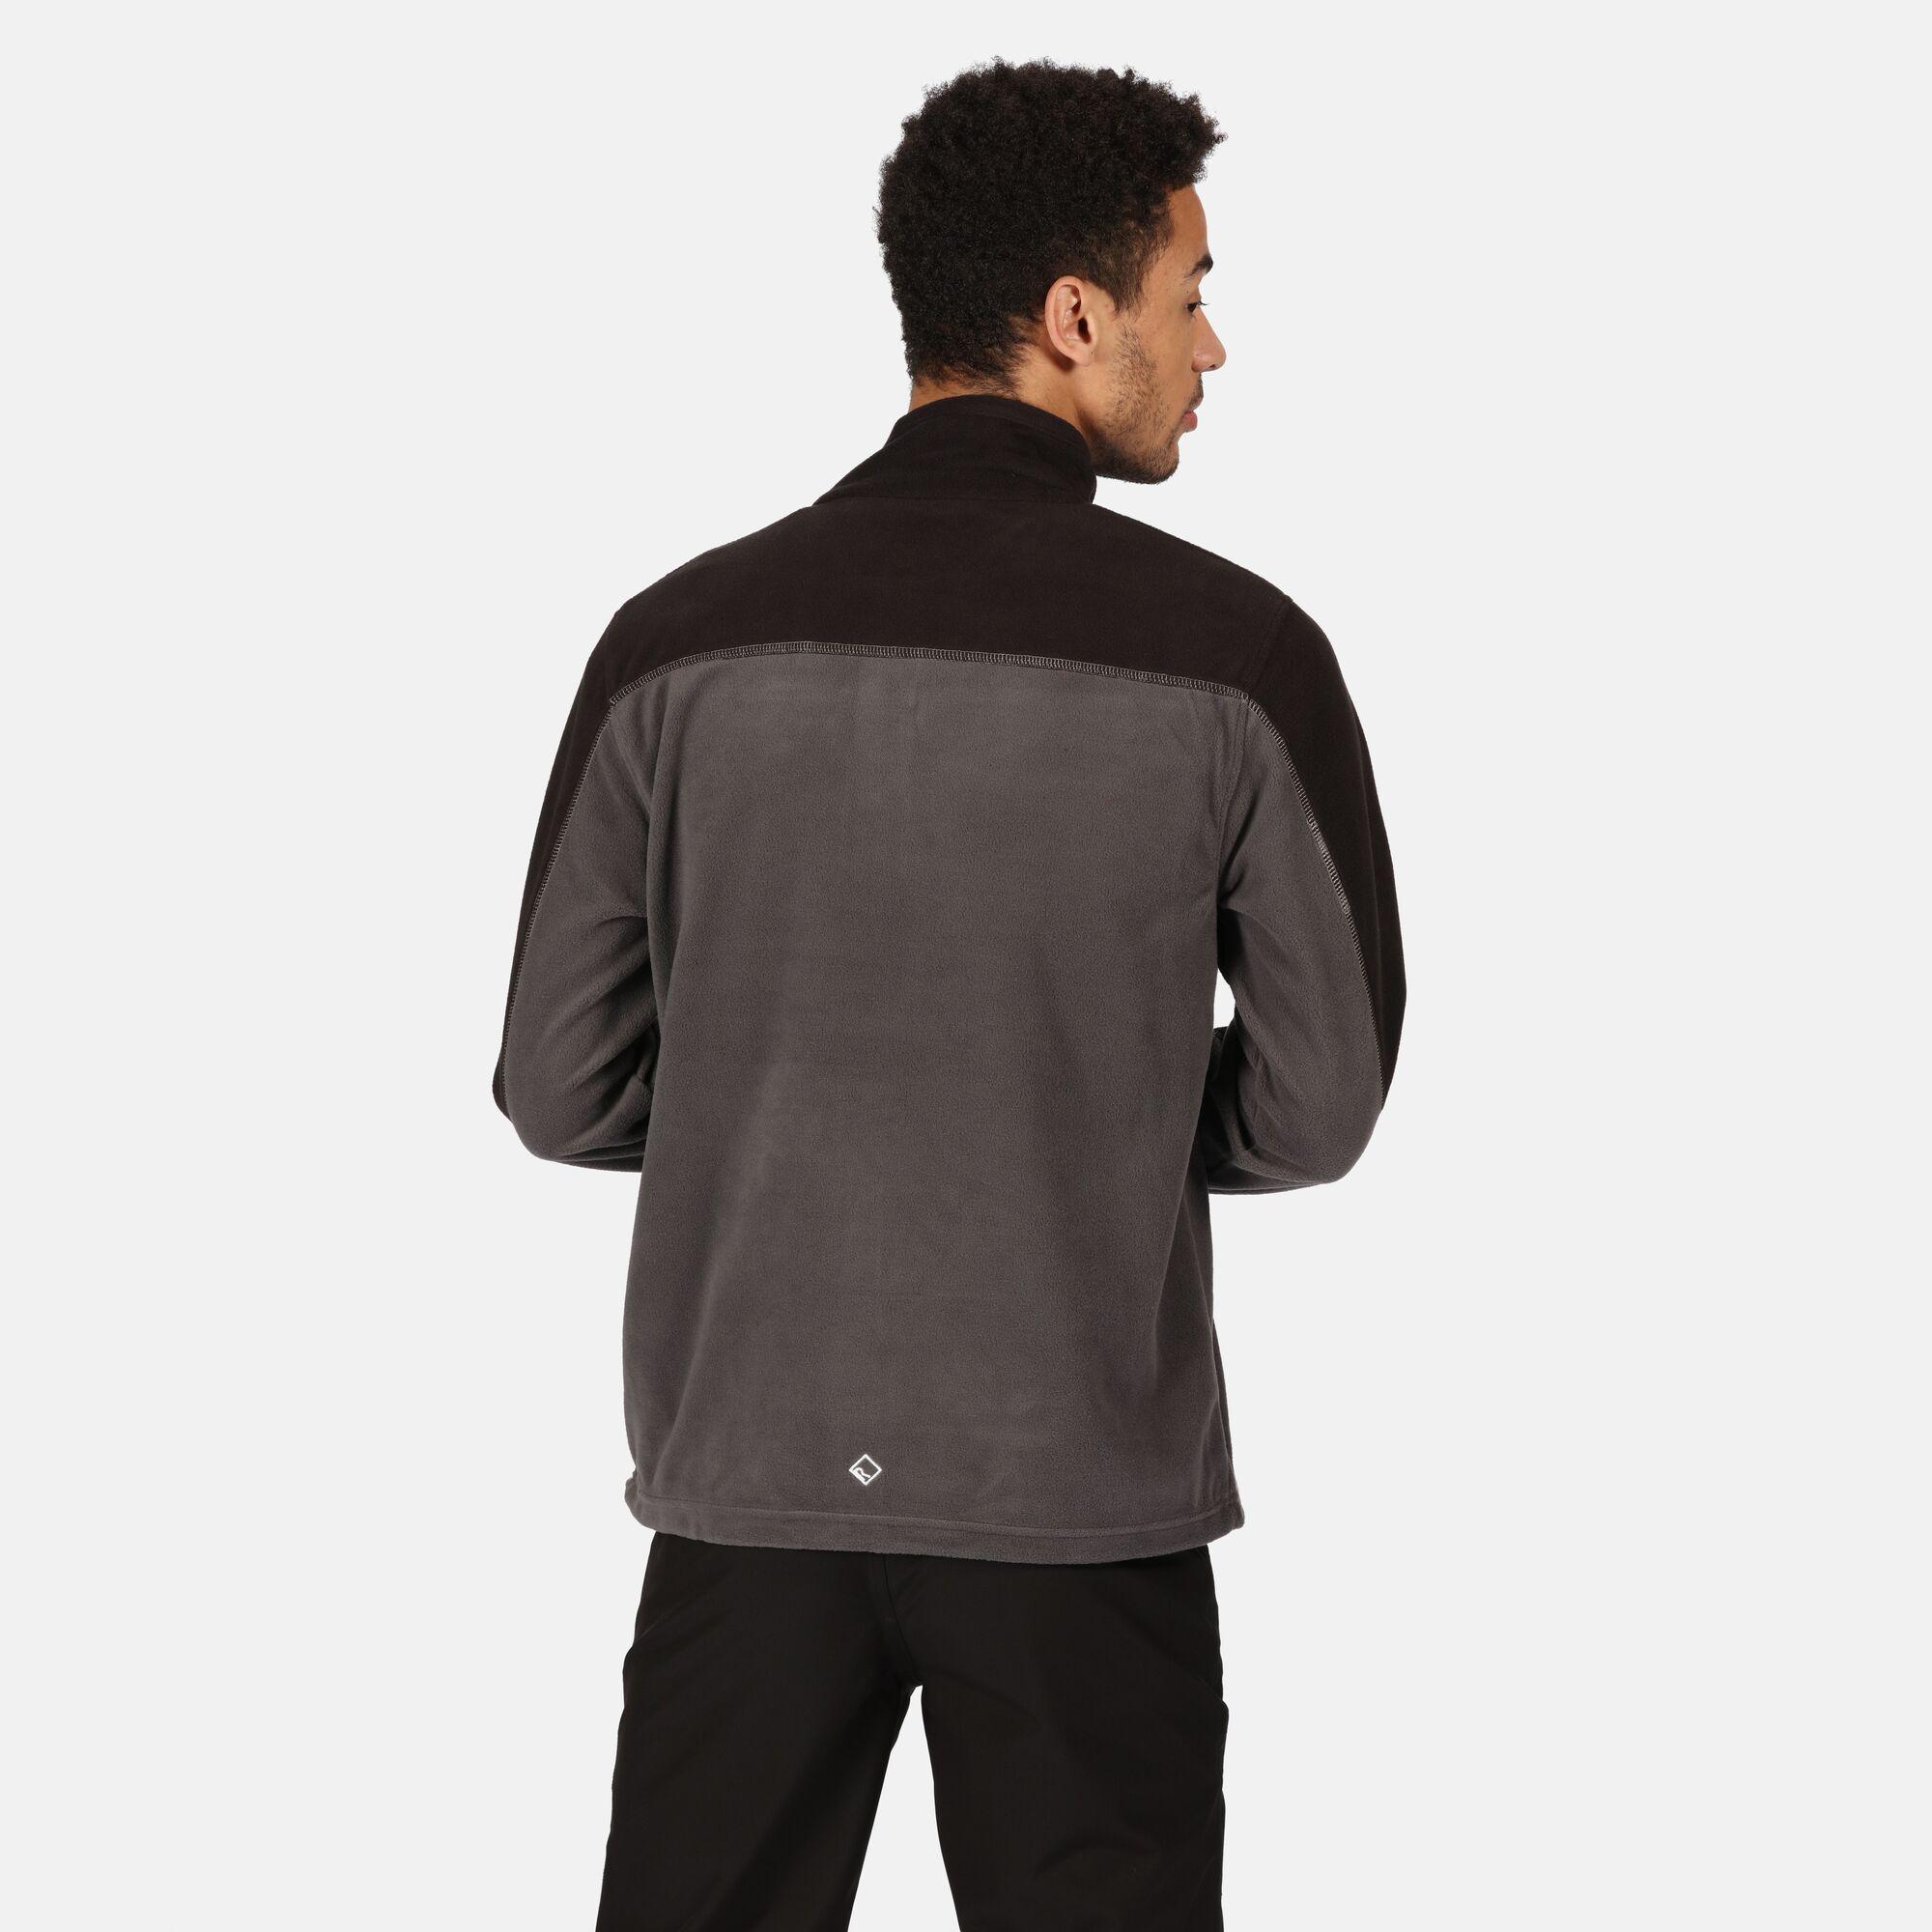 thumbnail 7 - Regatta Fellard Mens Lightweight Full Zip Warm Walking Fleece Jacket RRP £30